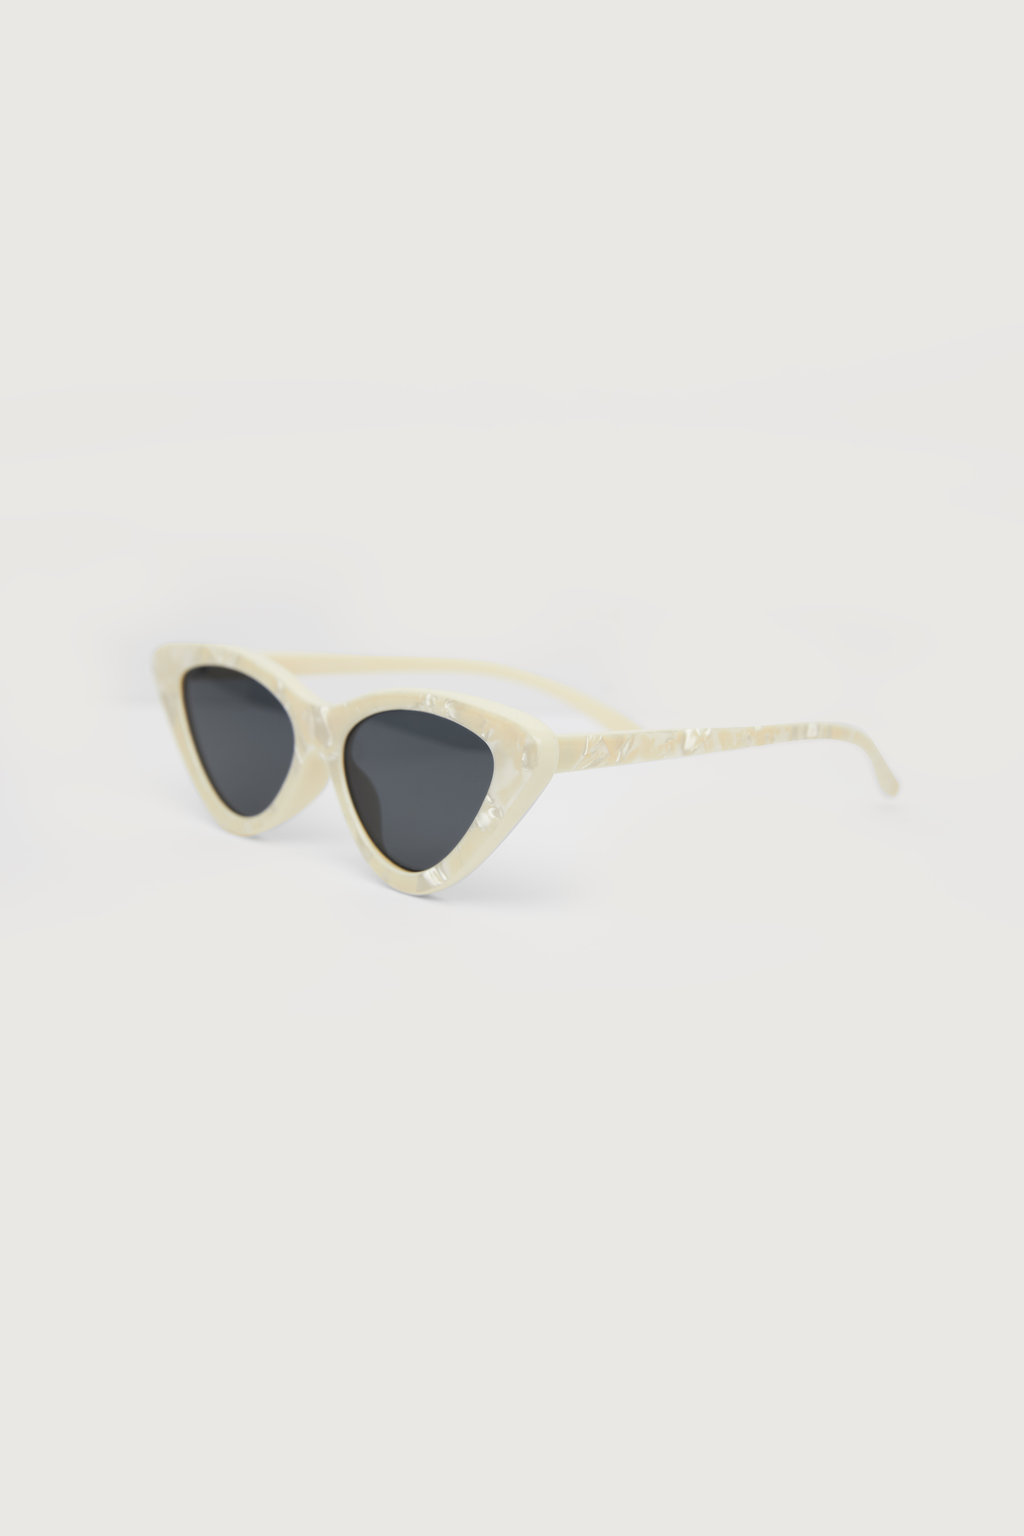 Sunglass 3369 Cream 5